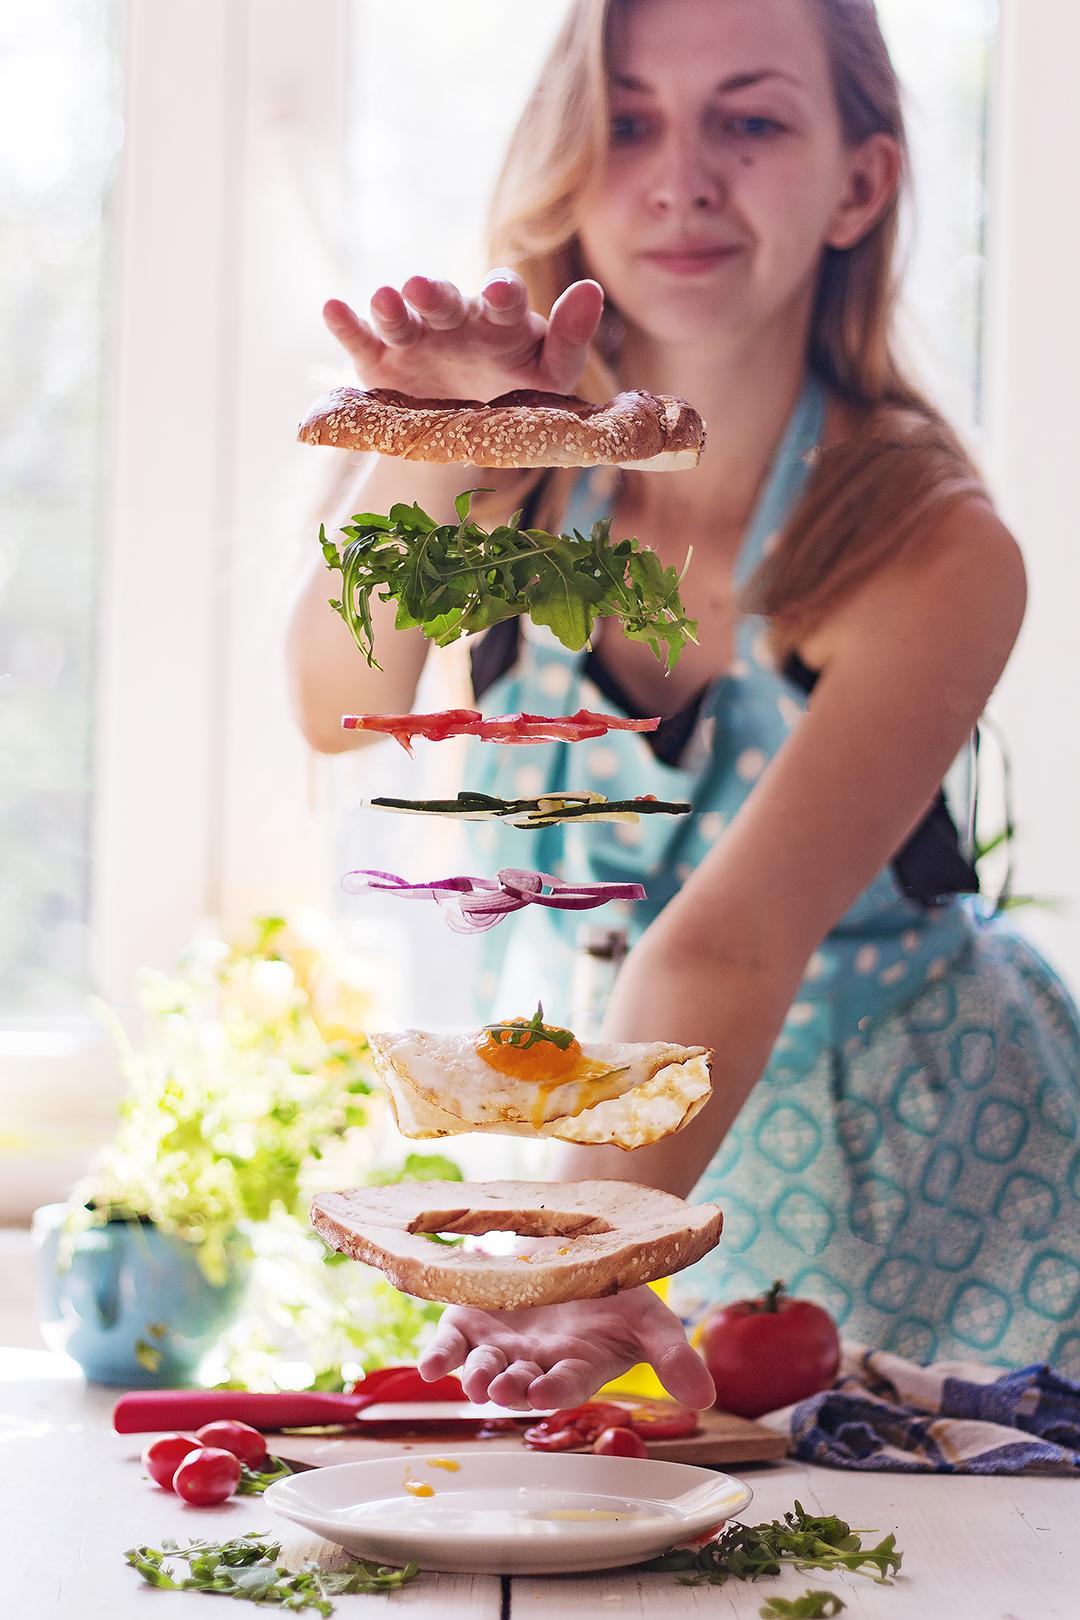 How to Create Floating Food - with KodakIt Photographer Olena Matkowska